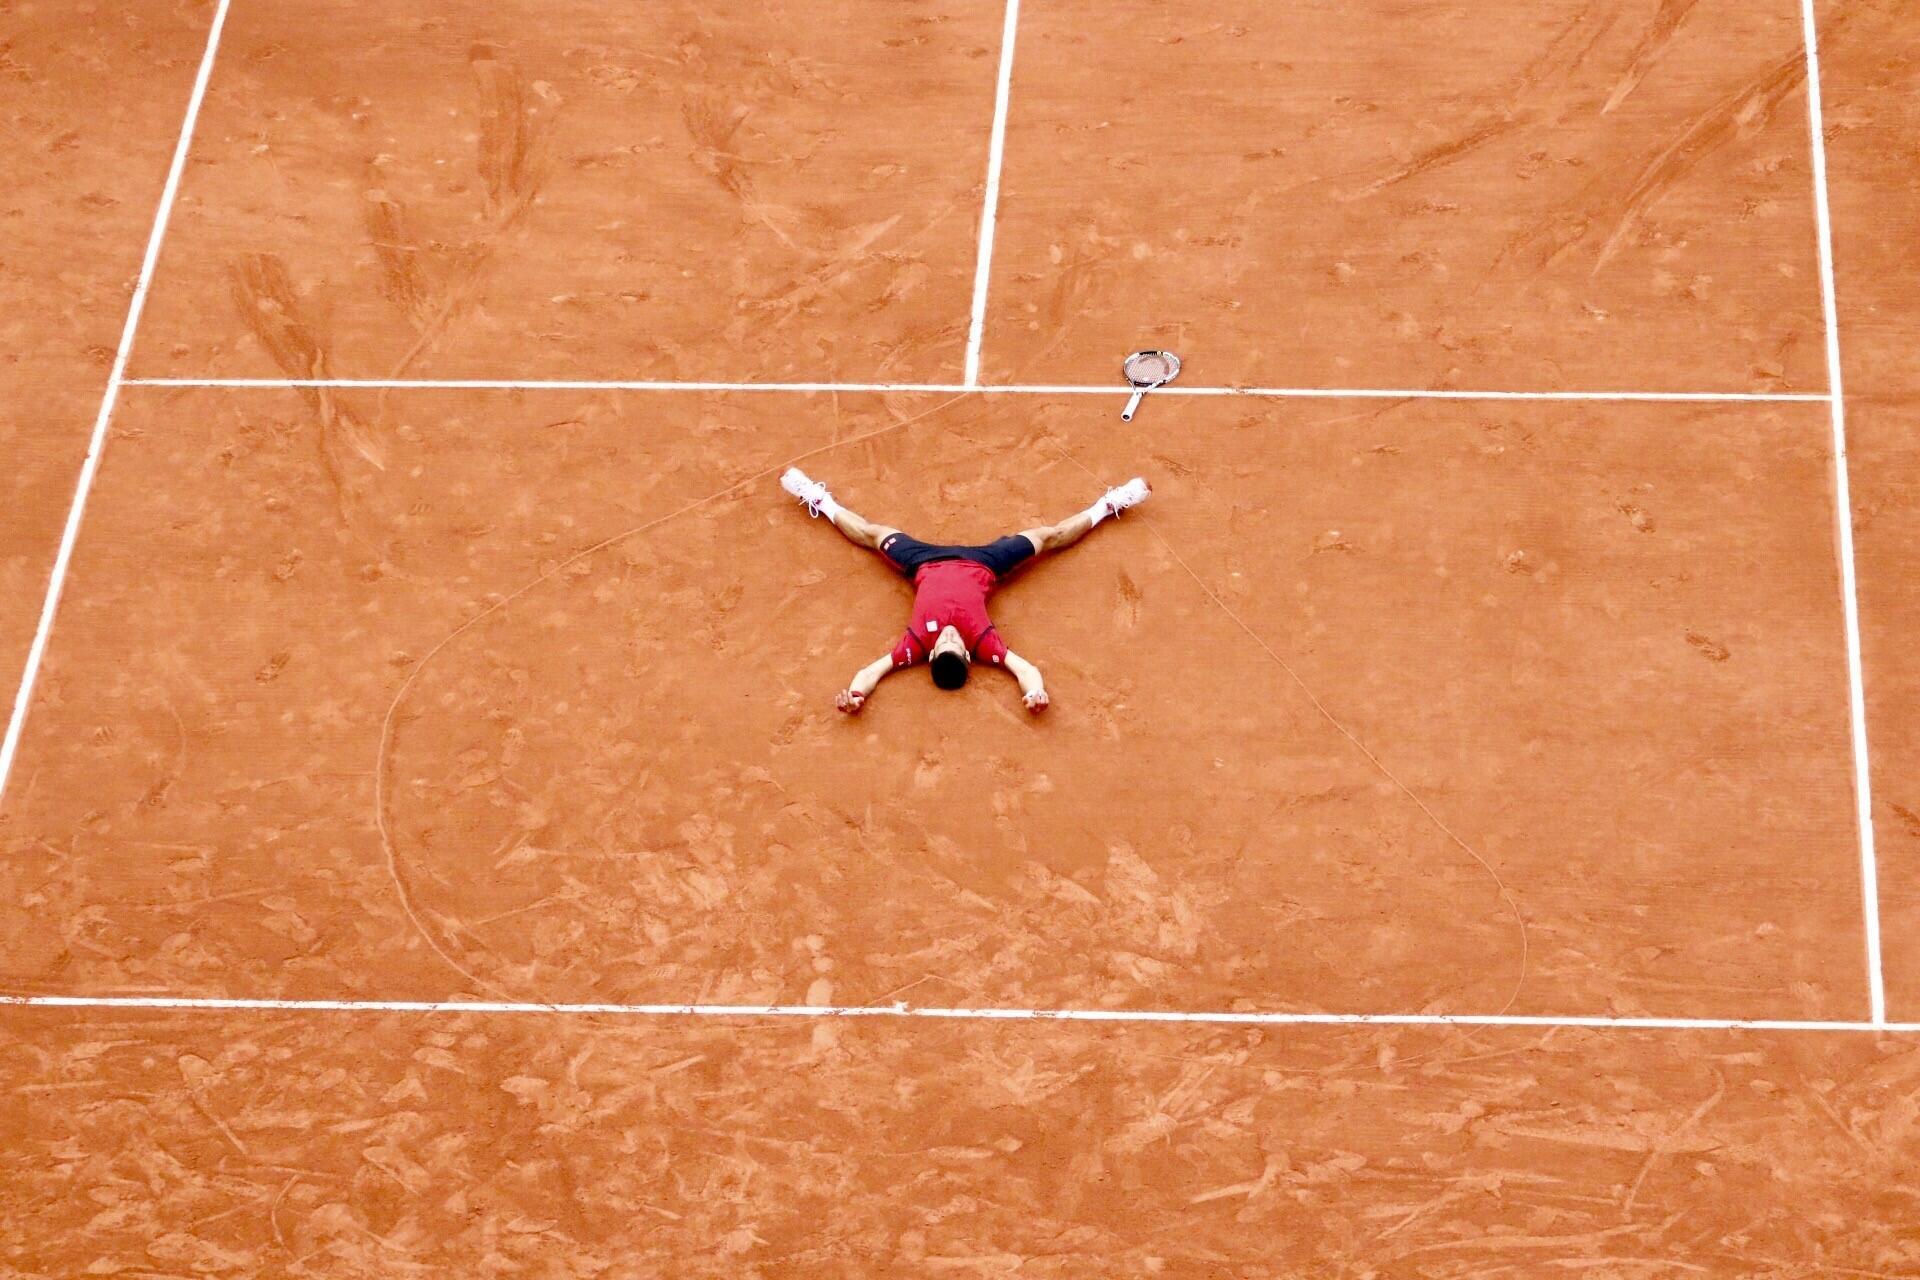 Al ganar, Djokovic dibujó un corazón como lo hizo el brasileño Gustavo Kuerten en 2000.